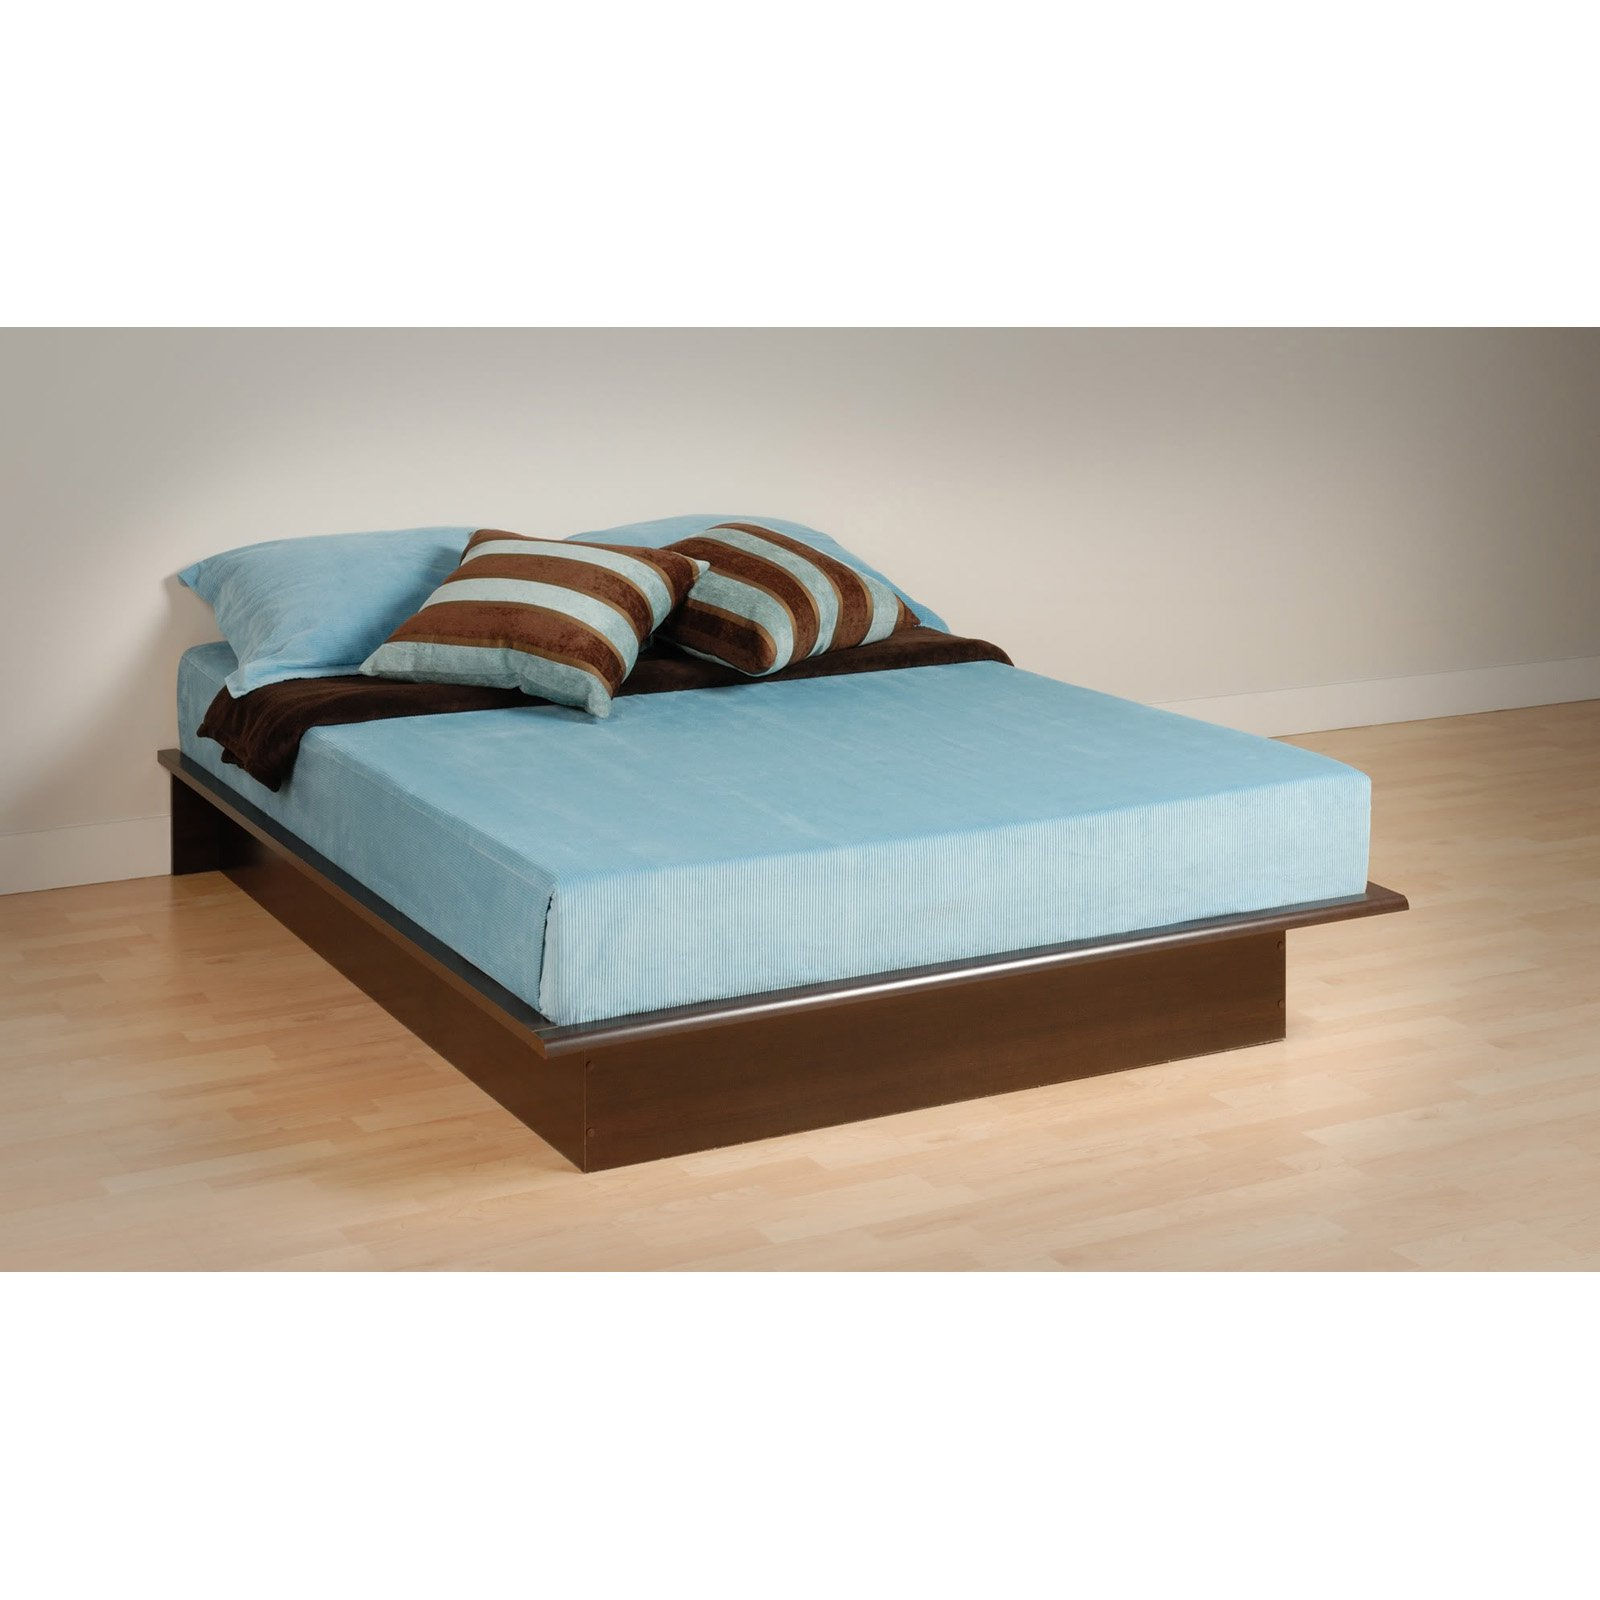 Queen Platform Bed, Espresso (Box 1 of 2)